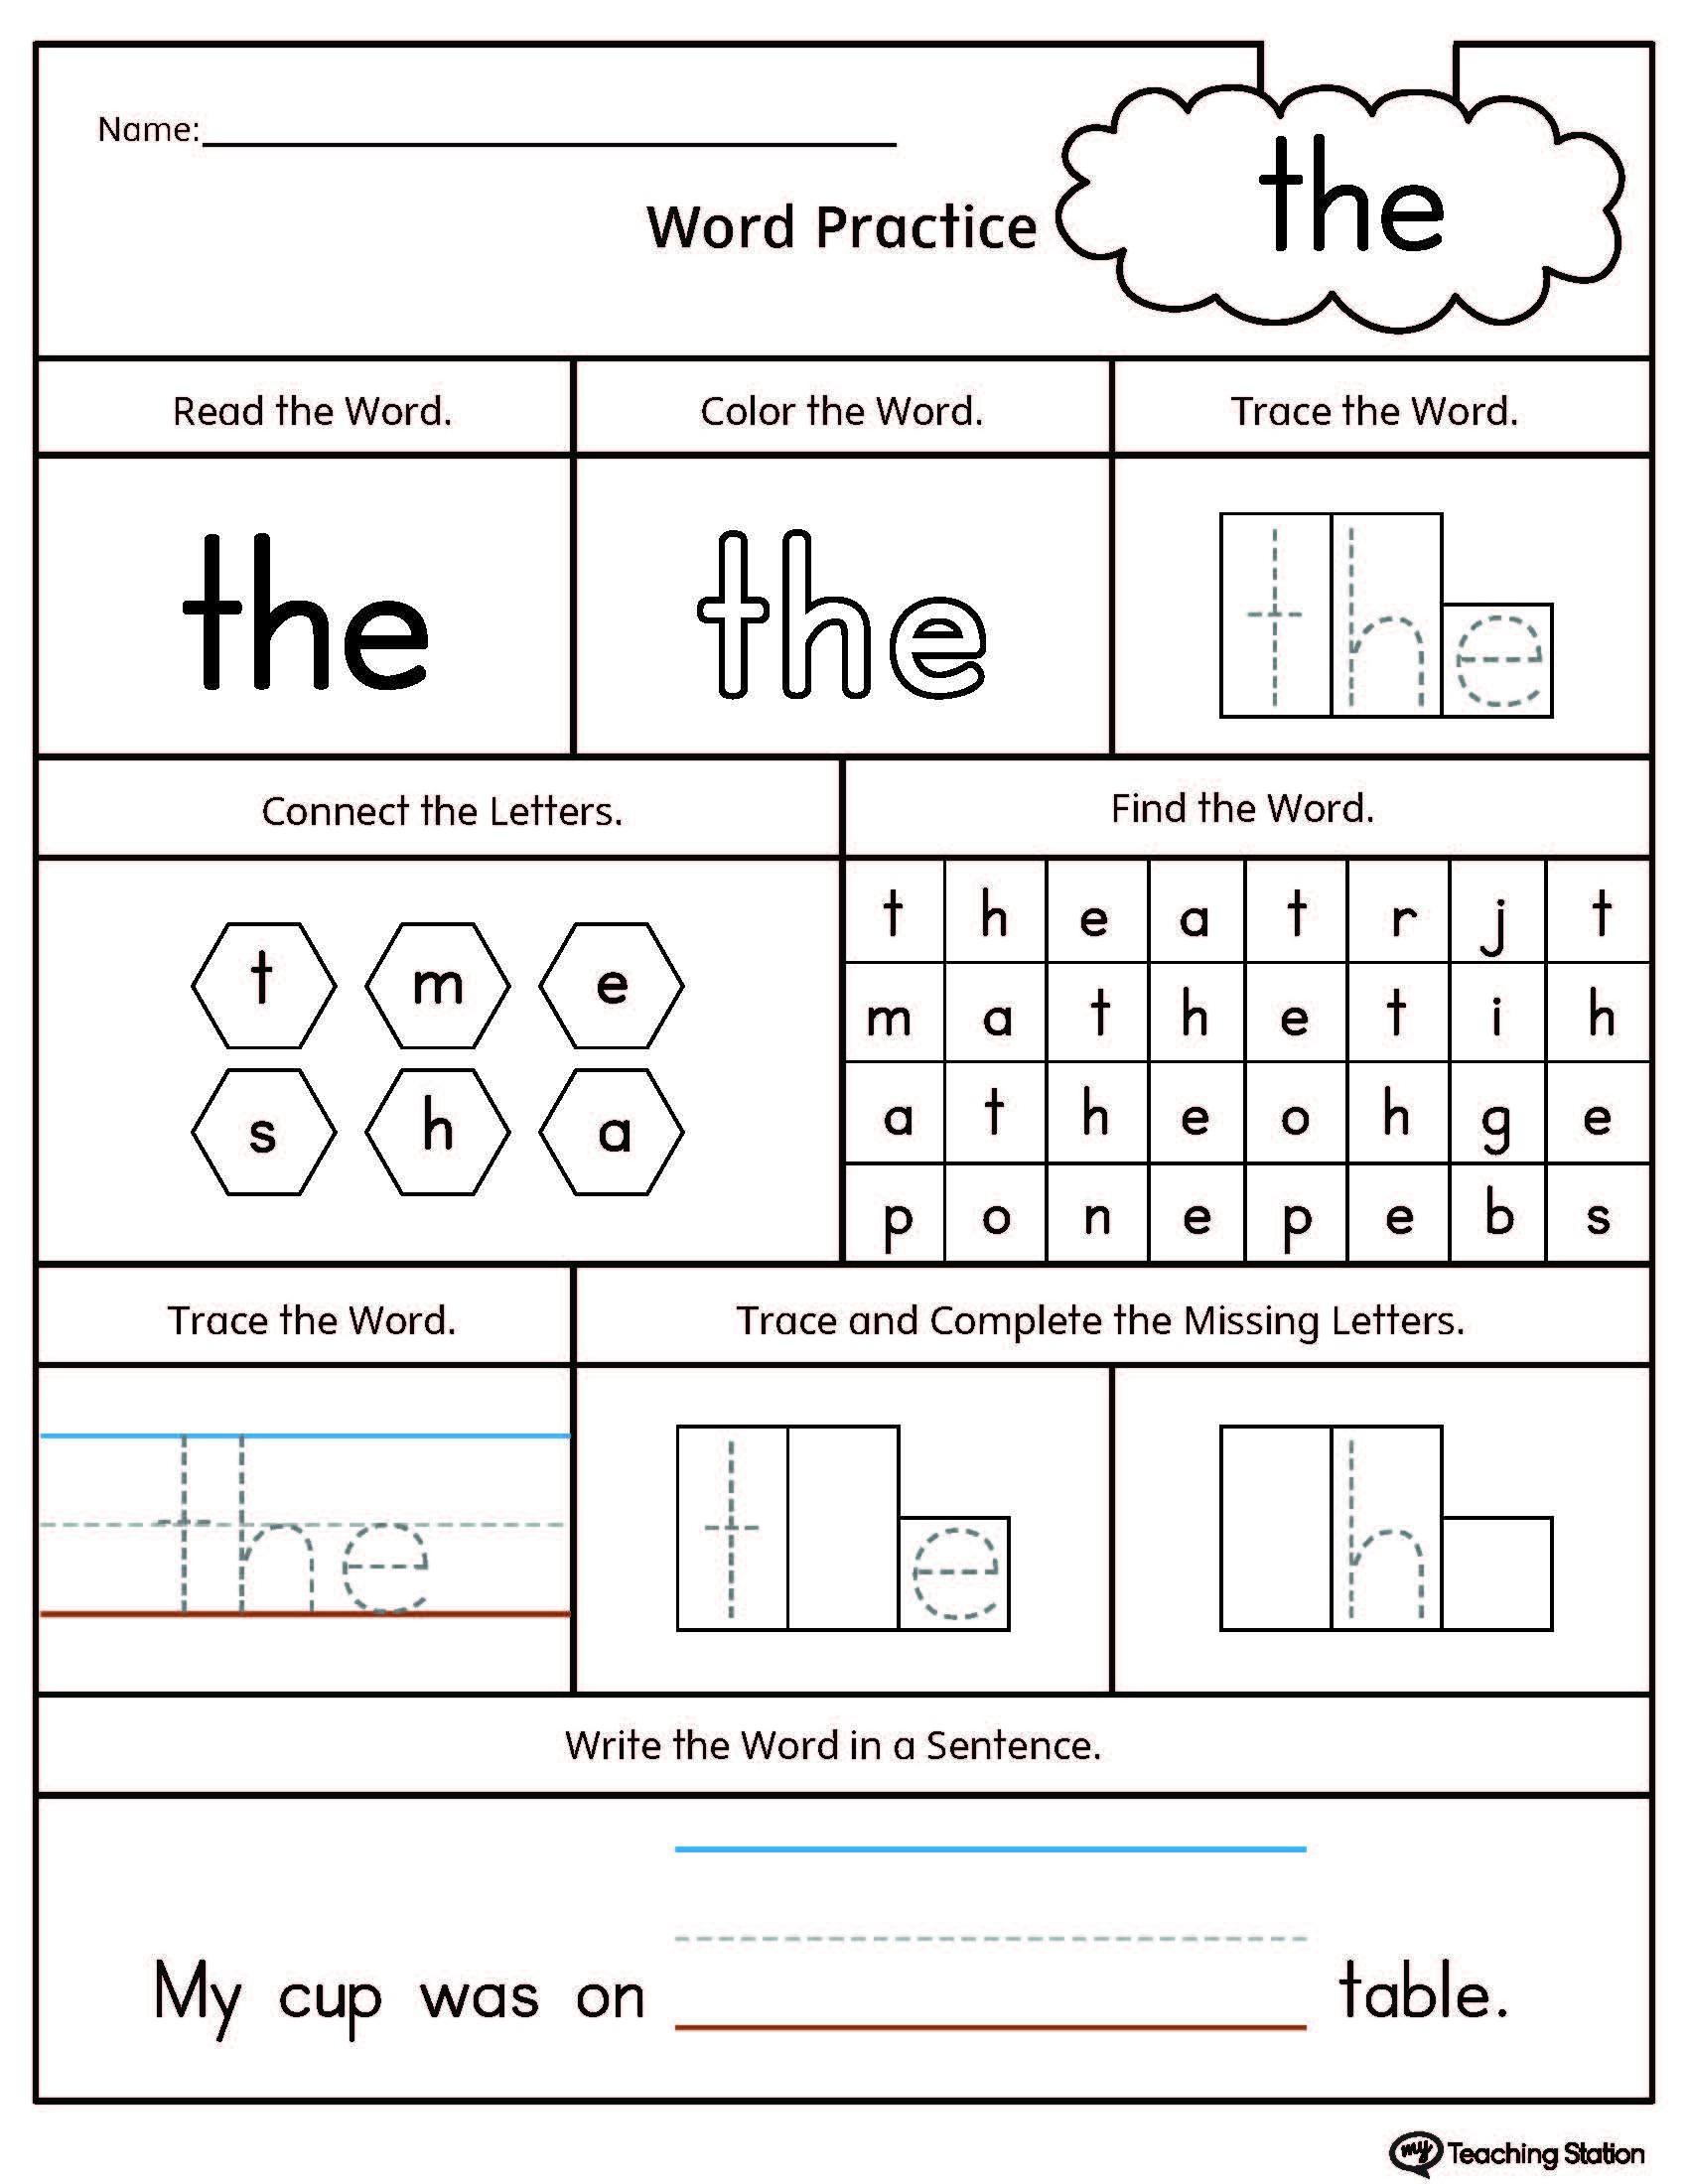 Sight Word The Printable Worksheet | Myteachingstation - Free Sight Word Printables